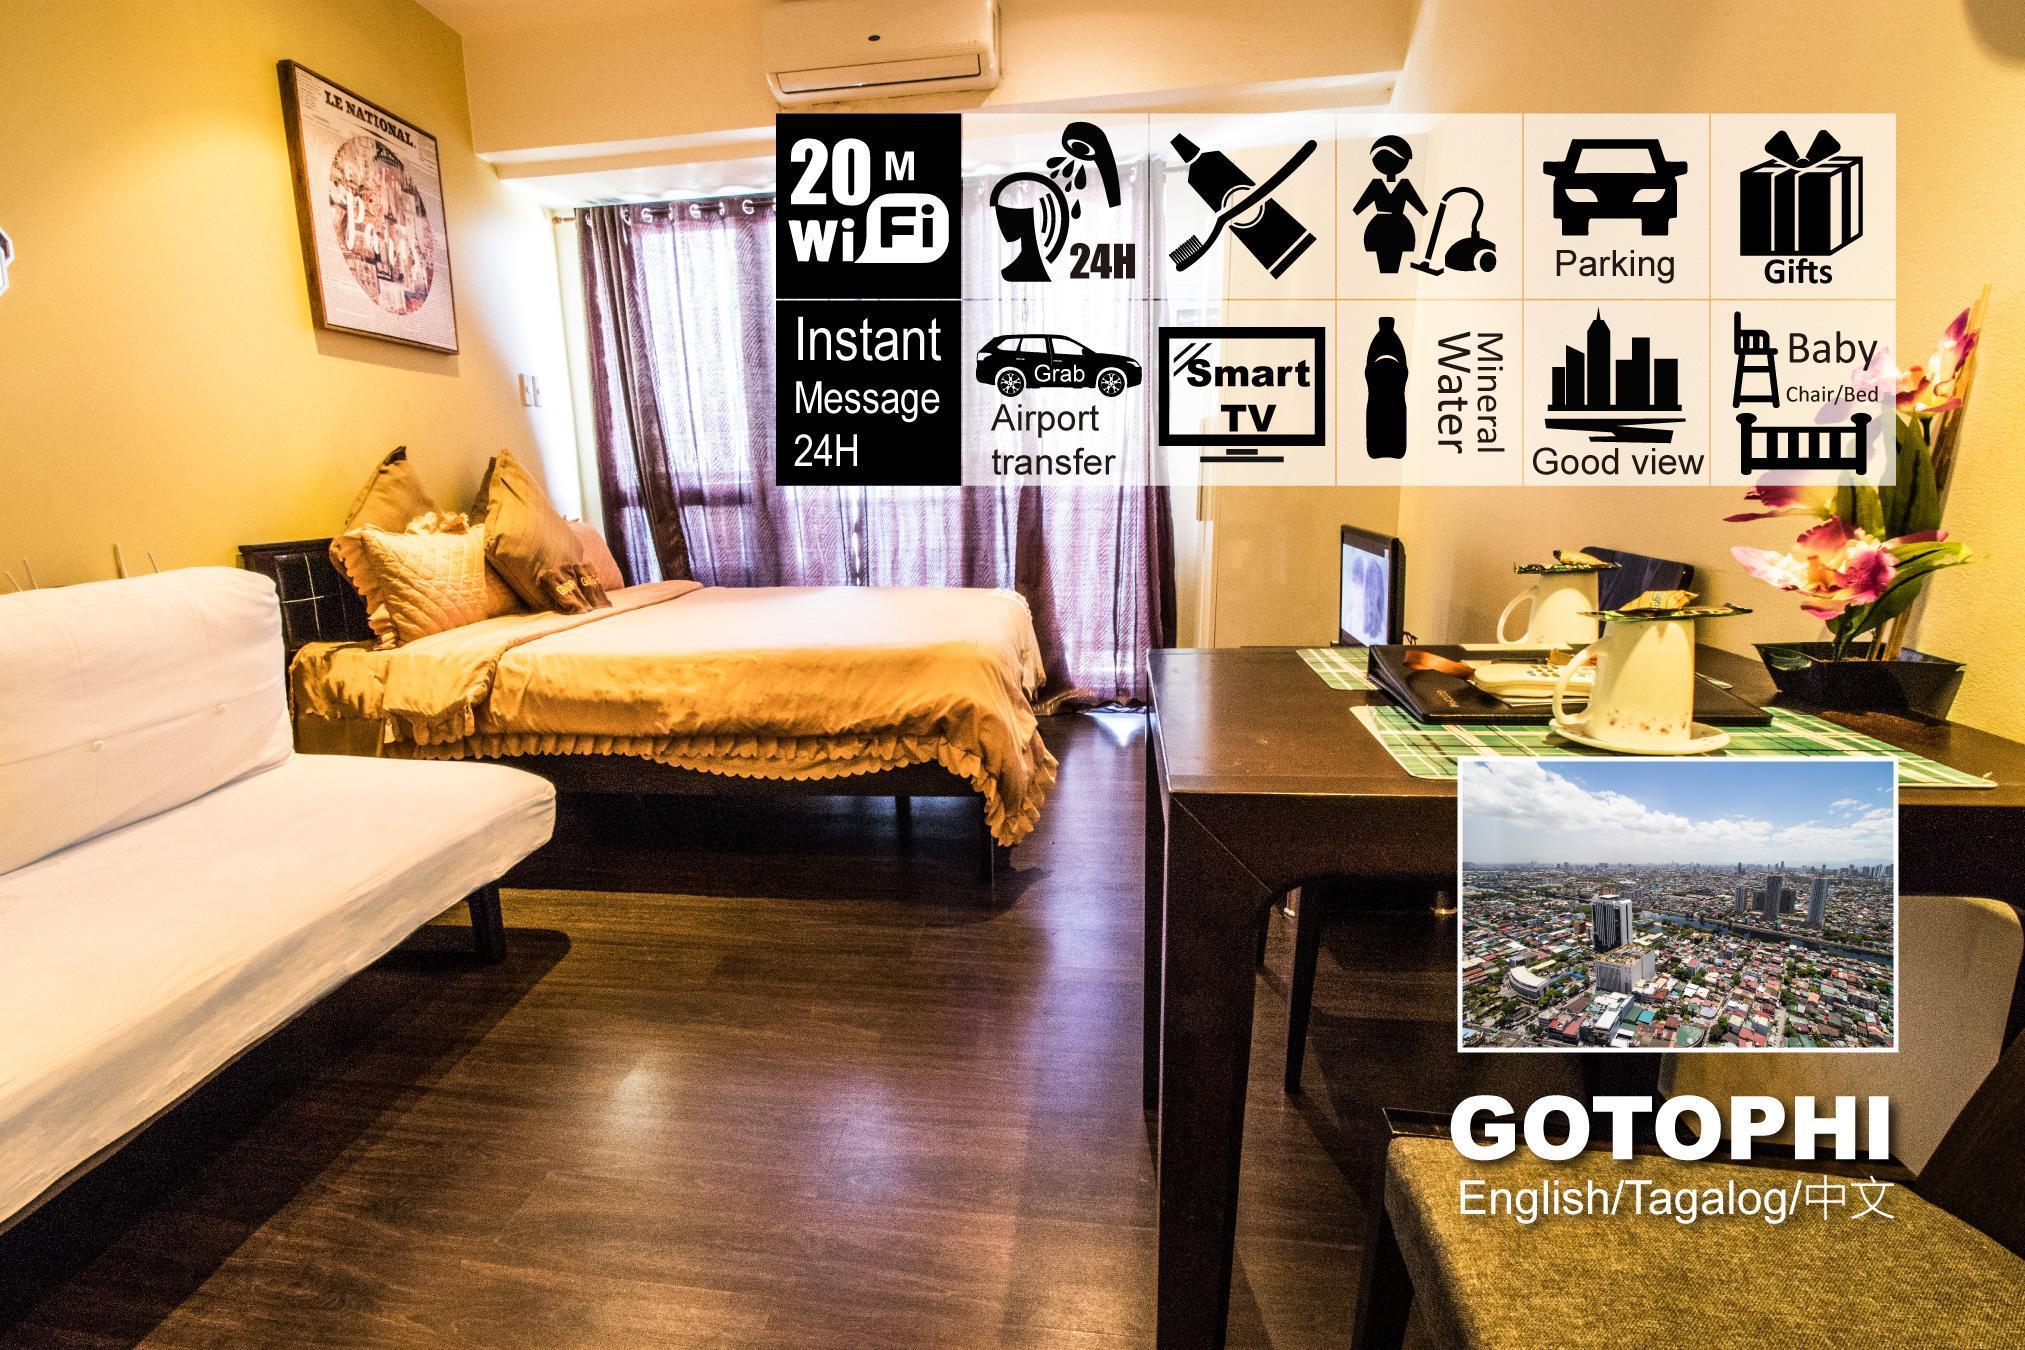 Gotophi Luxurious hotel Knightsbridge Makati 4922